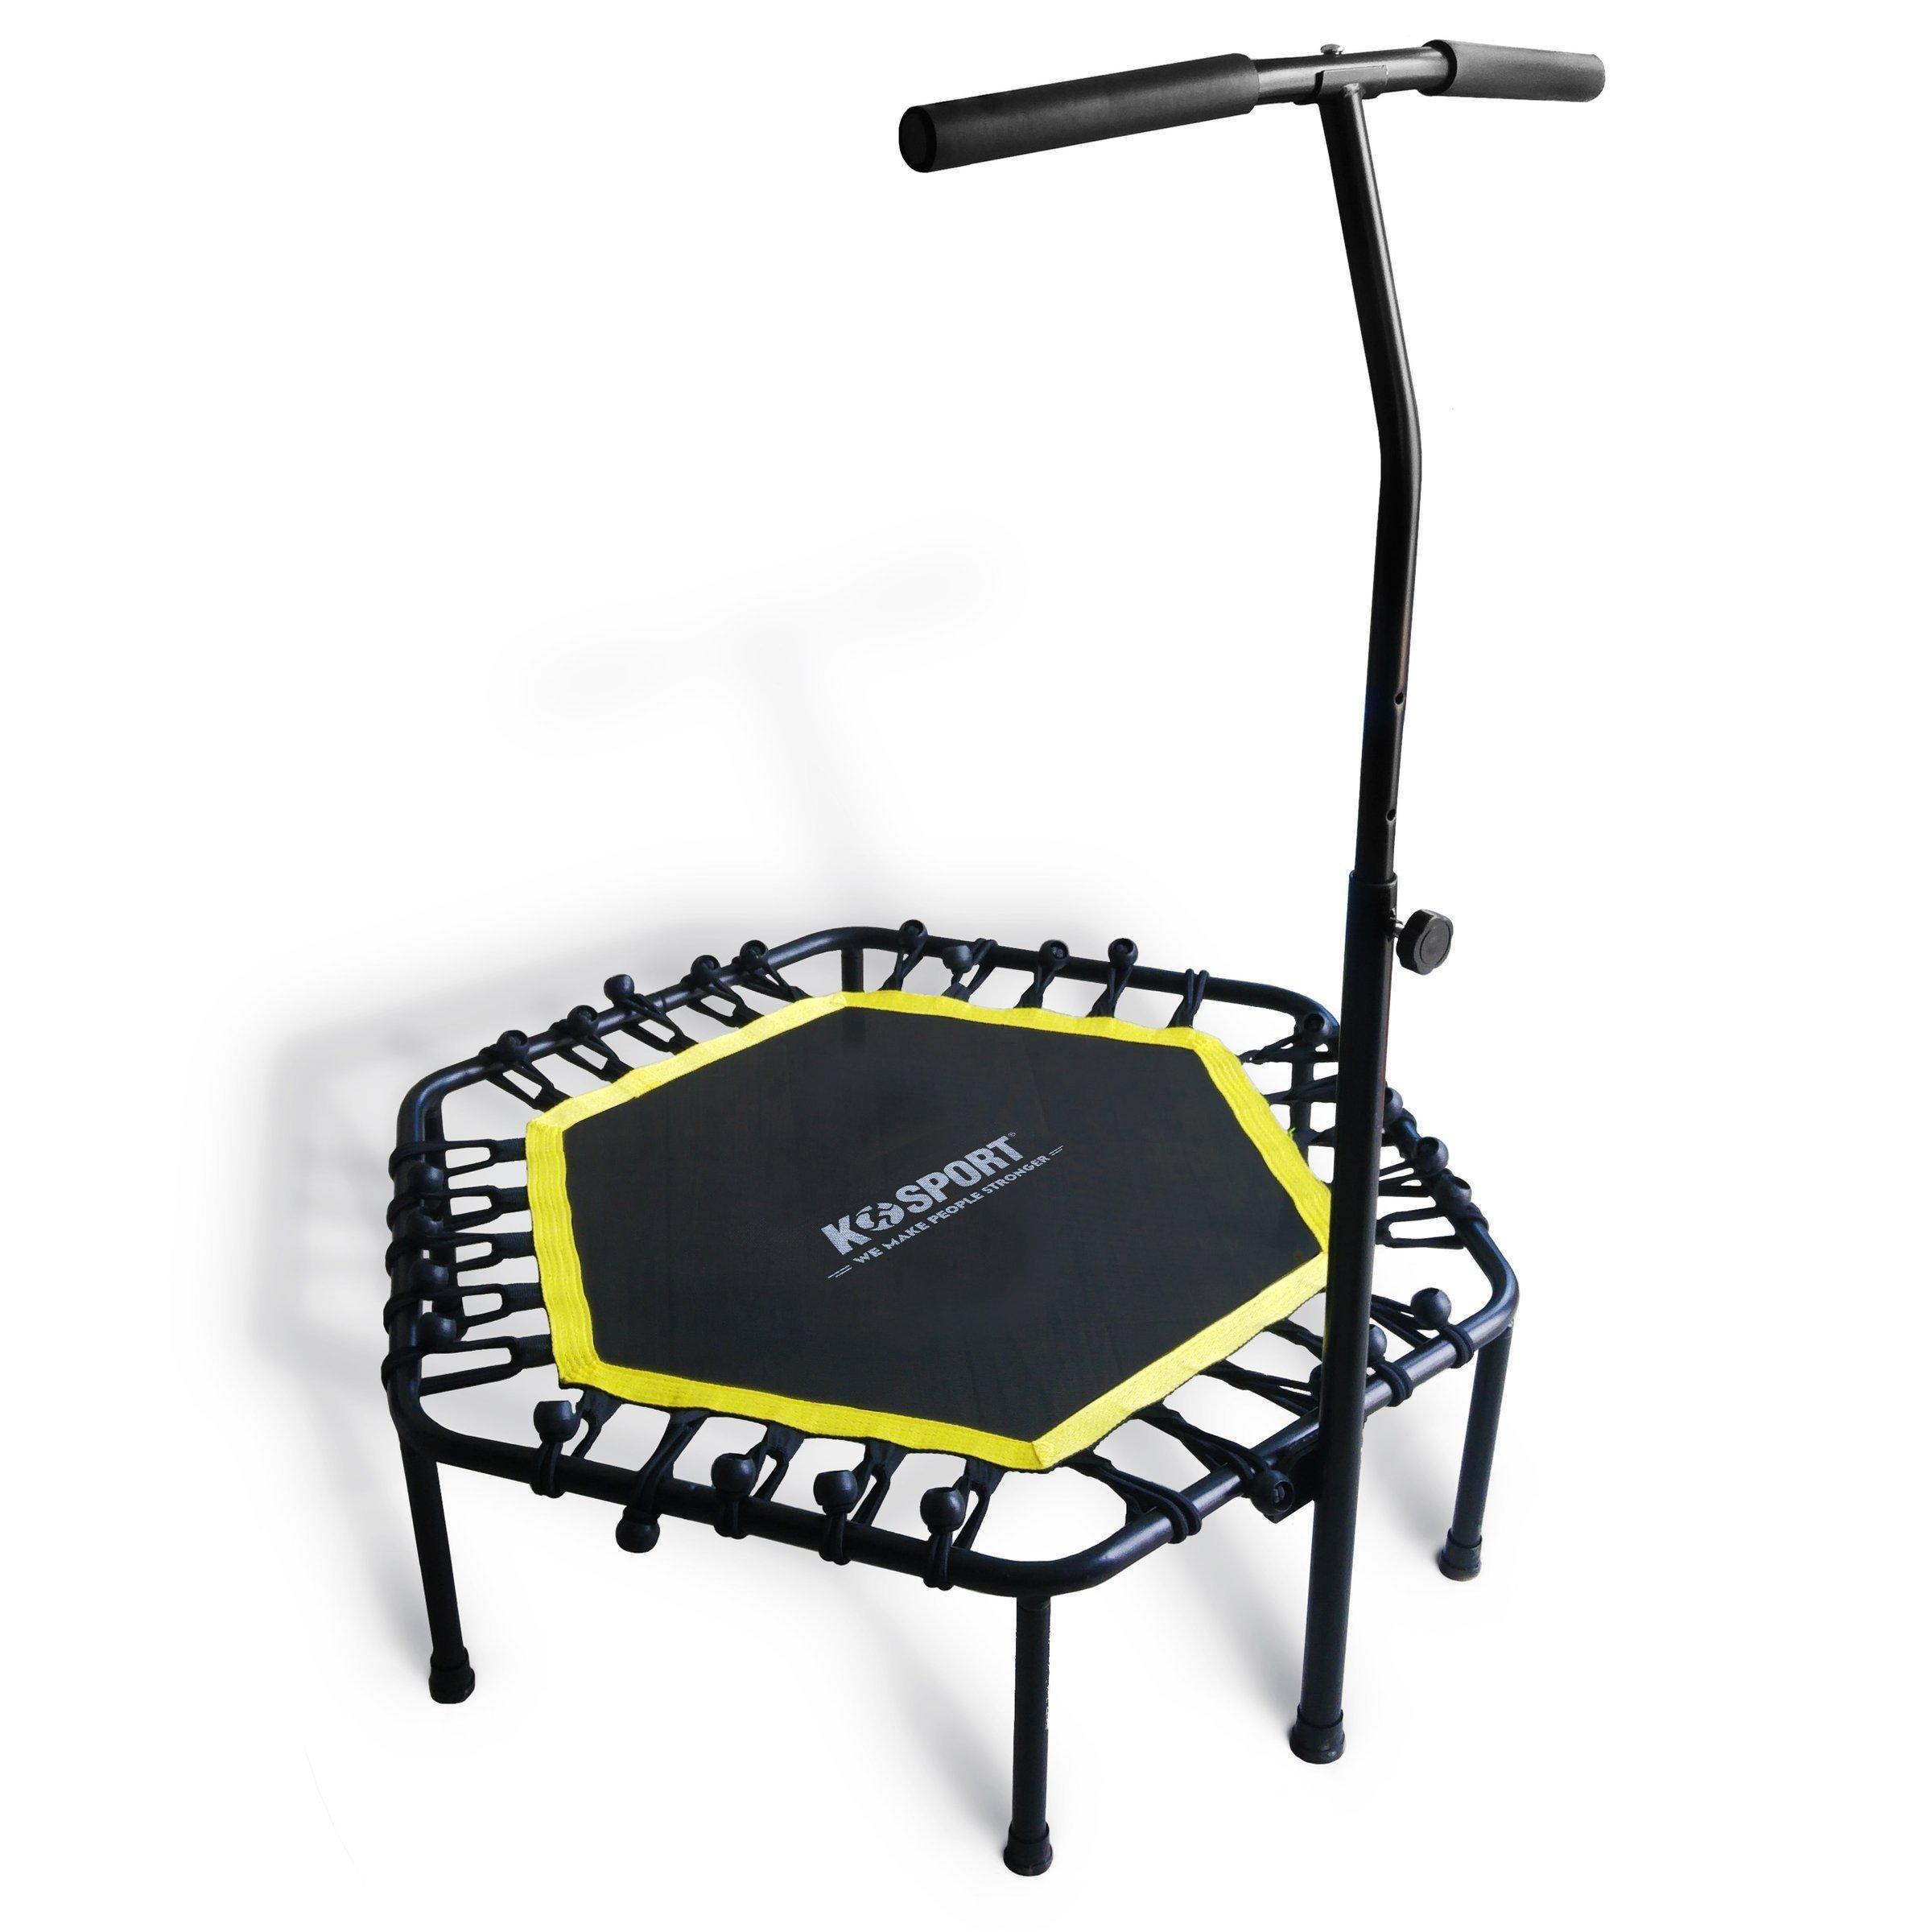 Mini Trampoline Exercise Bungee Rebounder